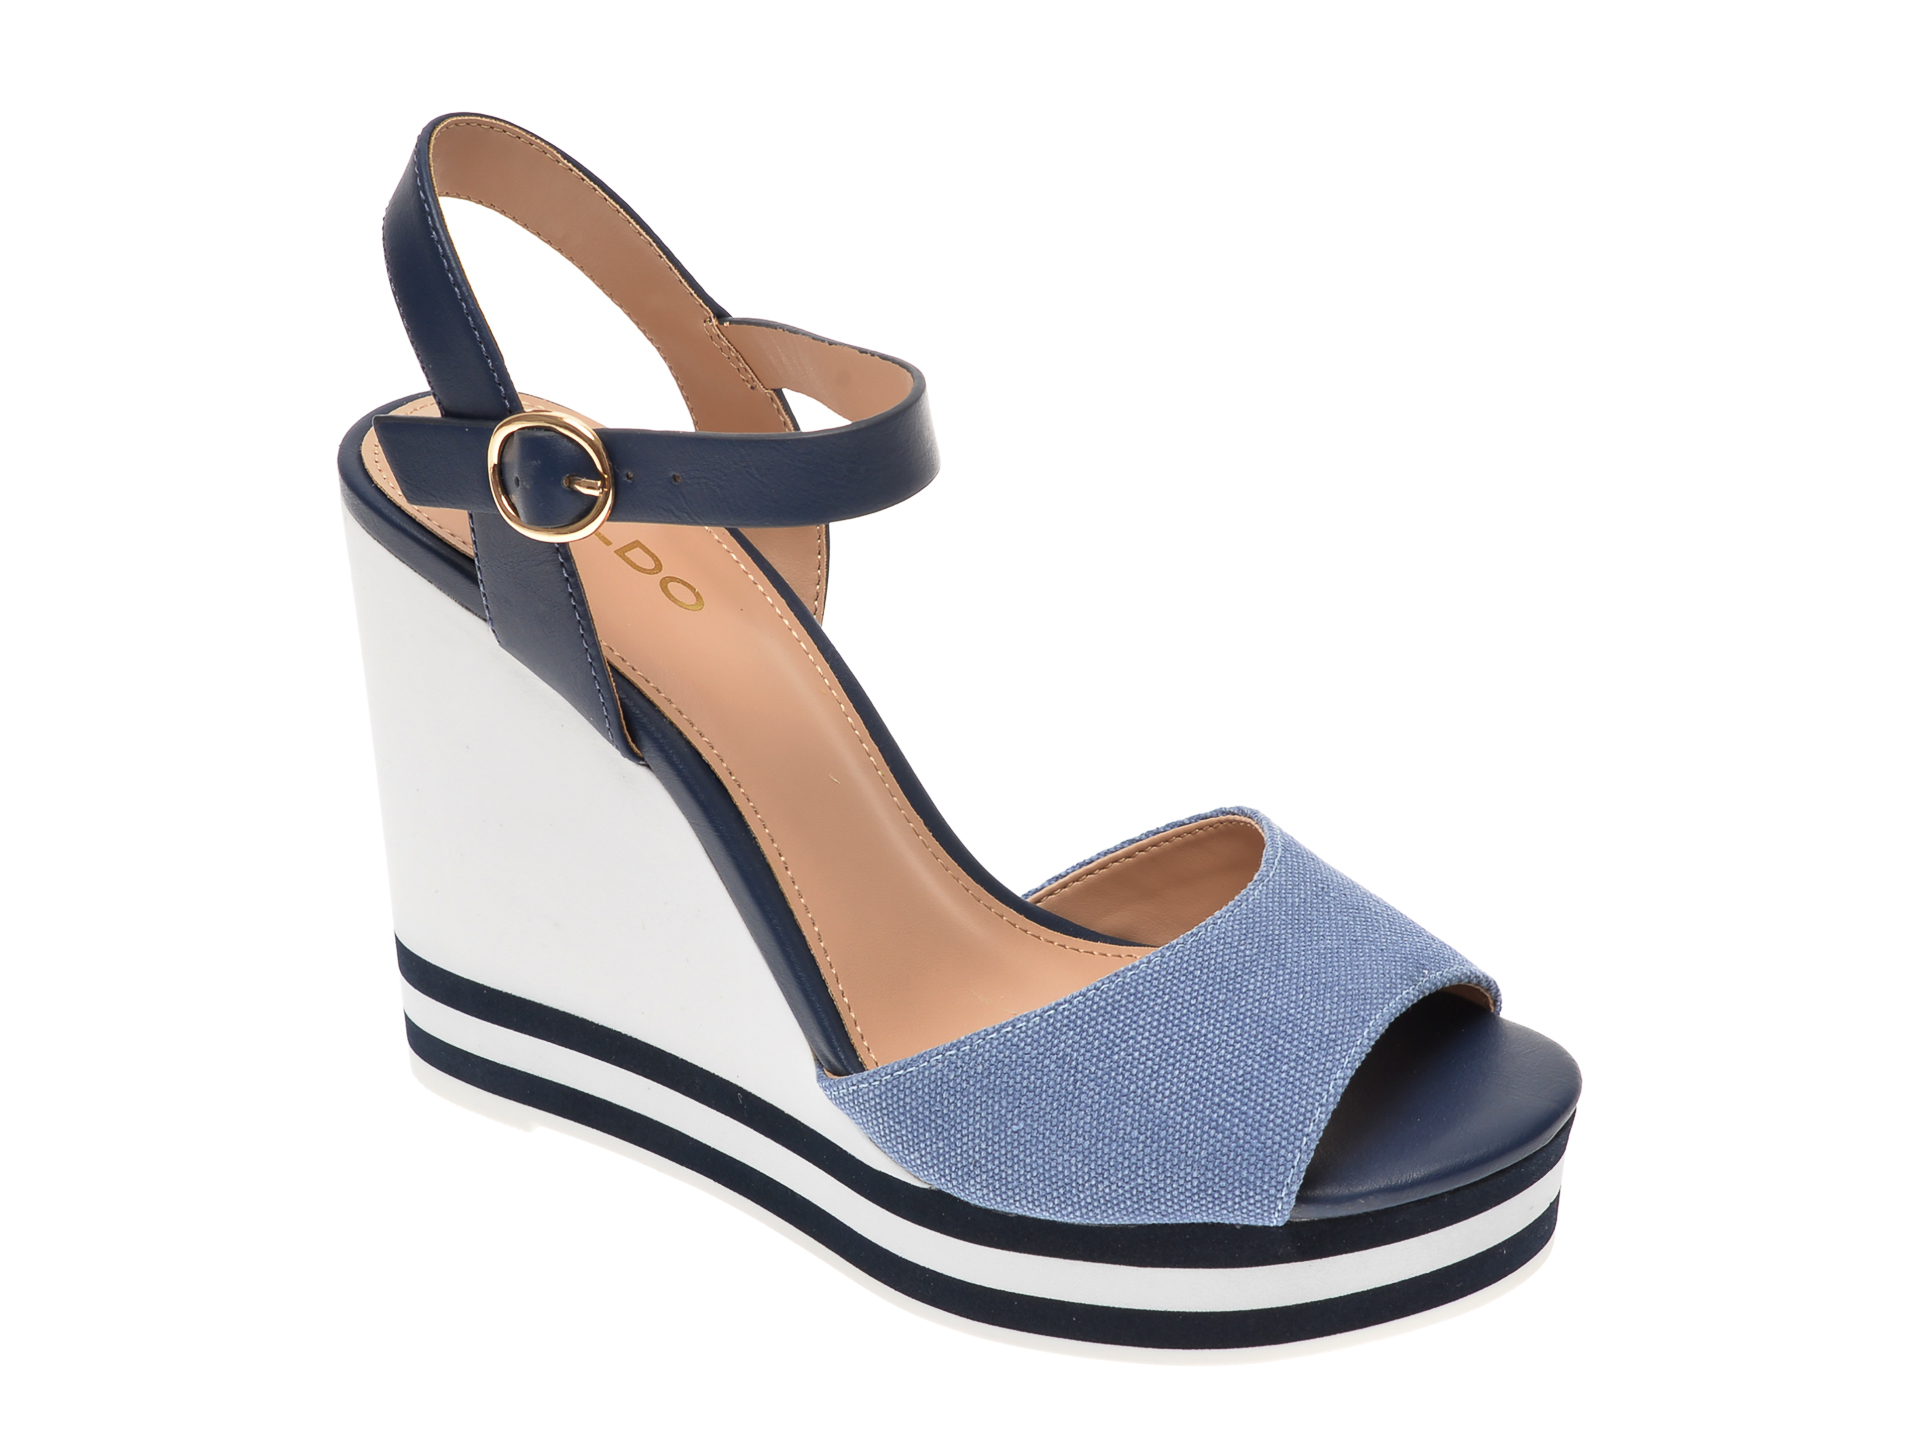 Sandale ALDO bleumarin, Broa410, din material textil imagine